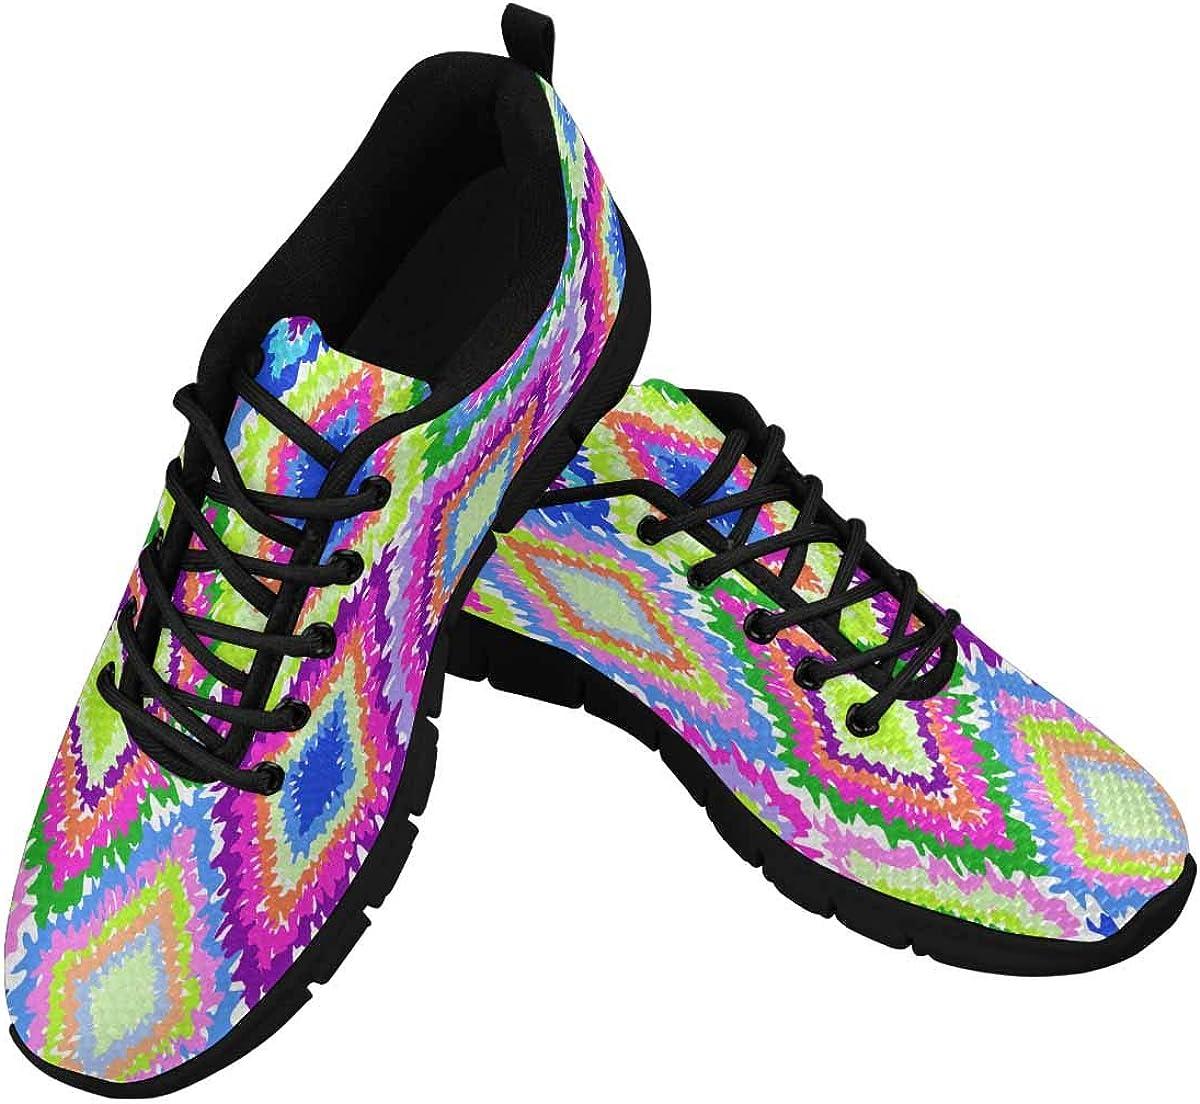 InterestPrint Neon Geometric Print Women's Breathable Sneaker